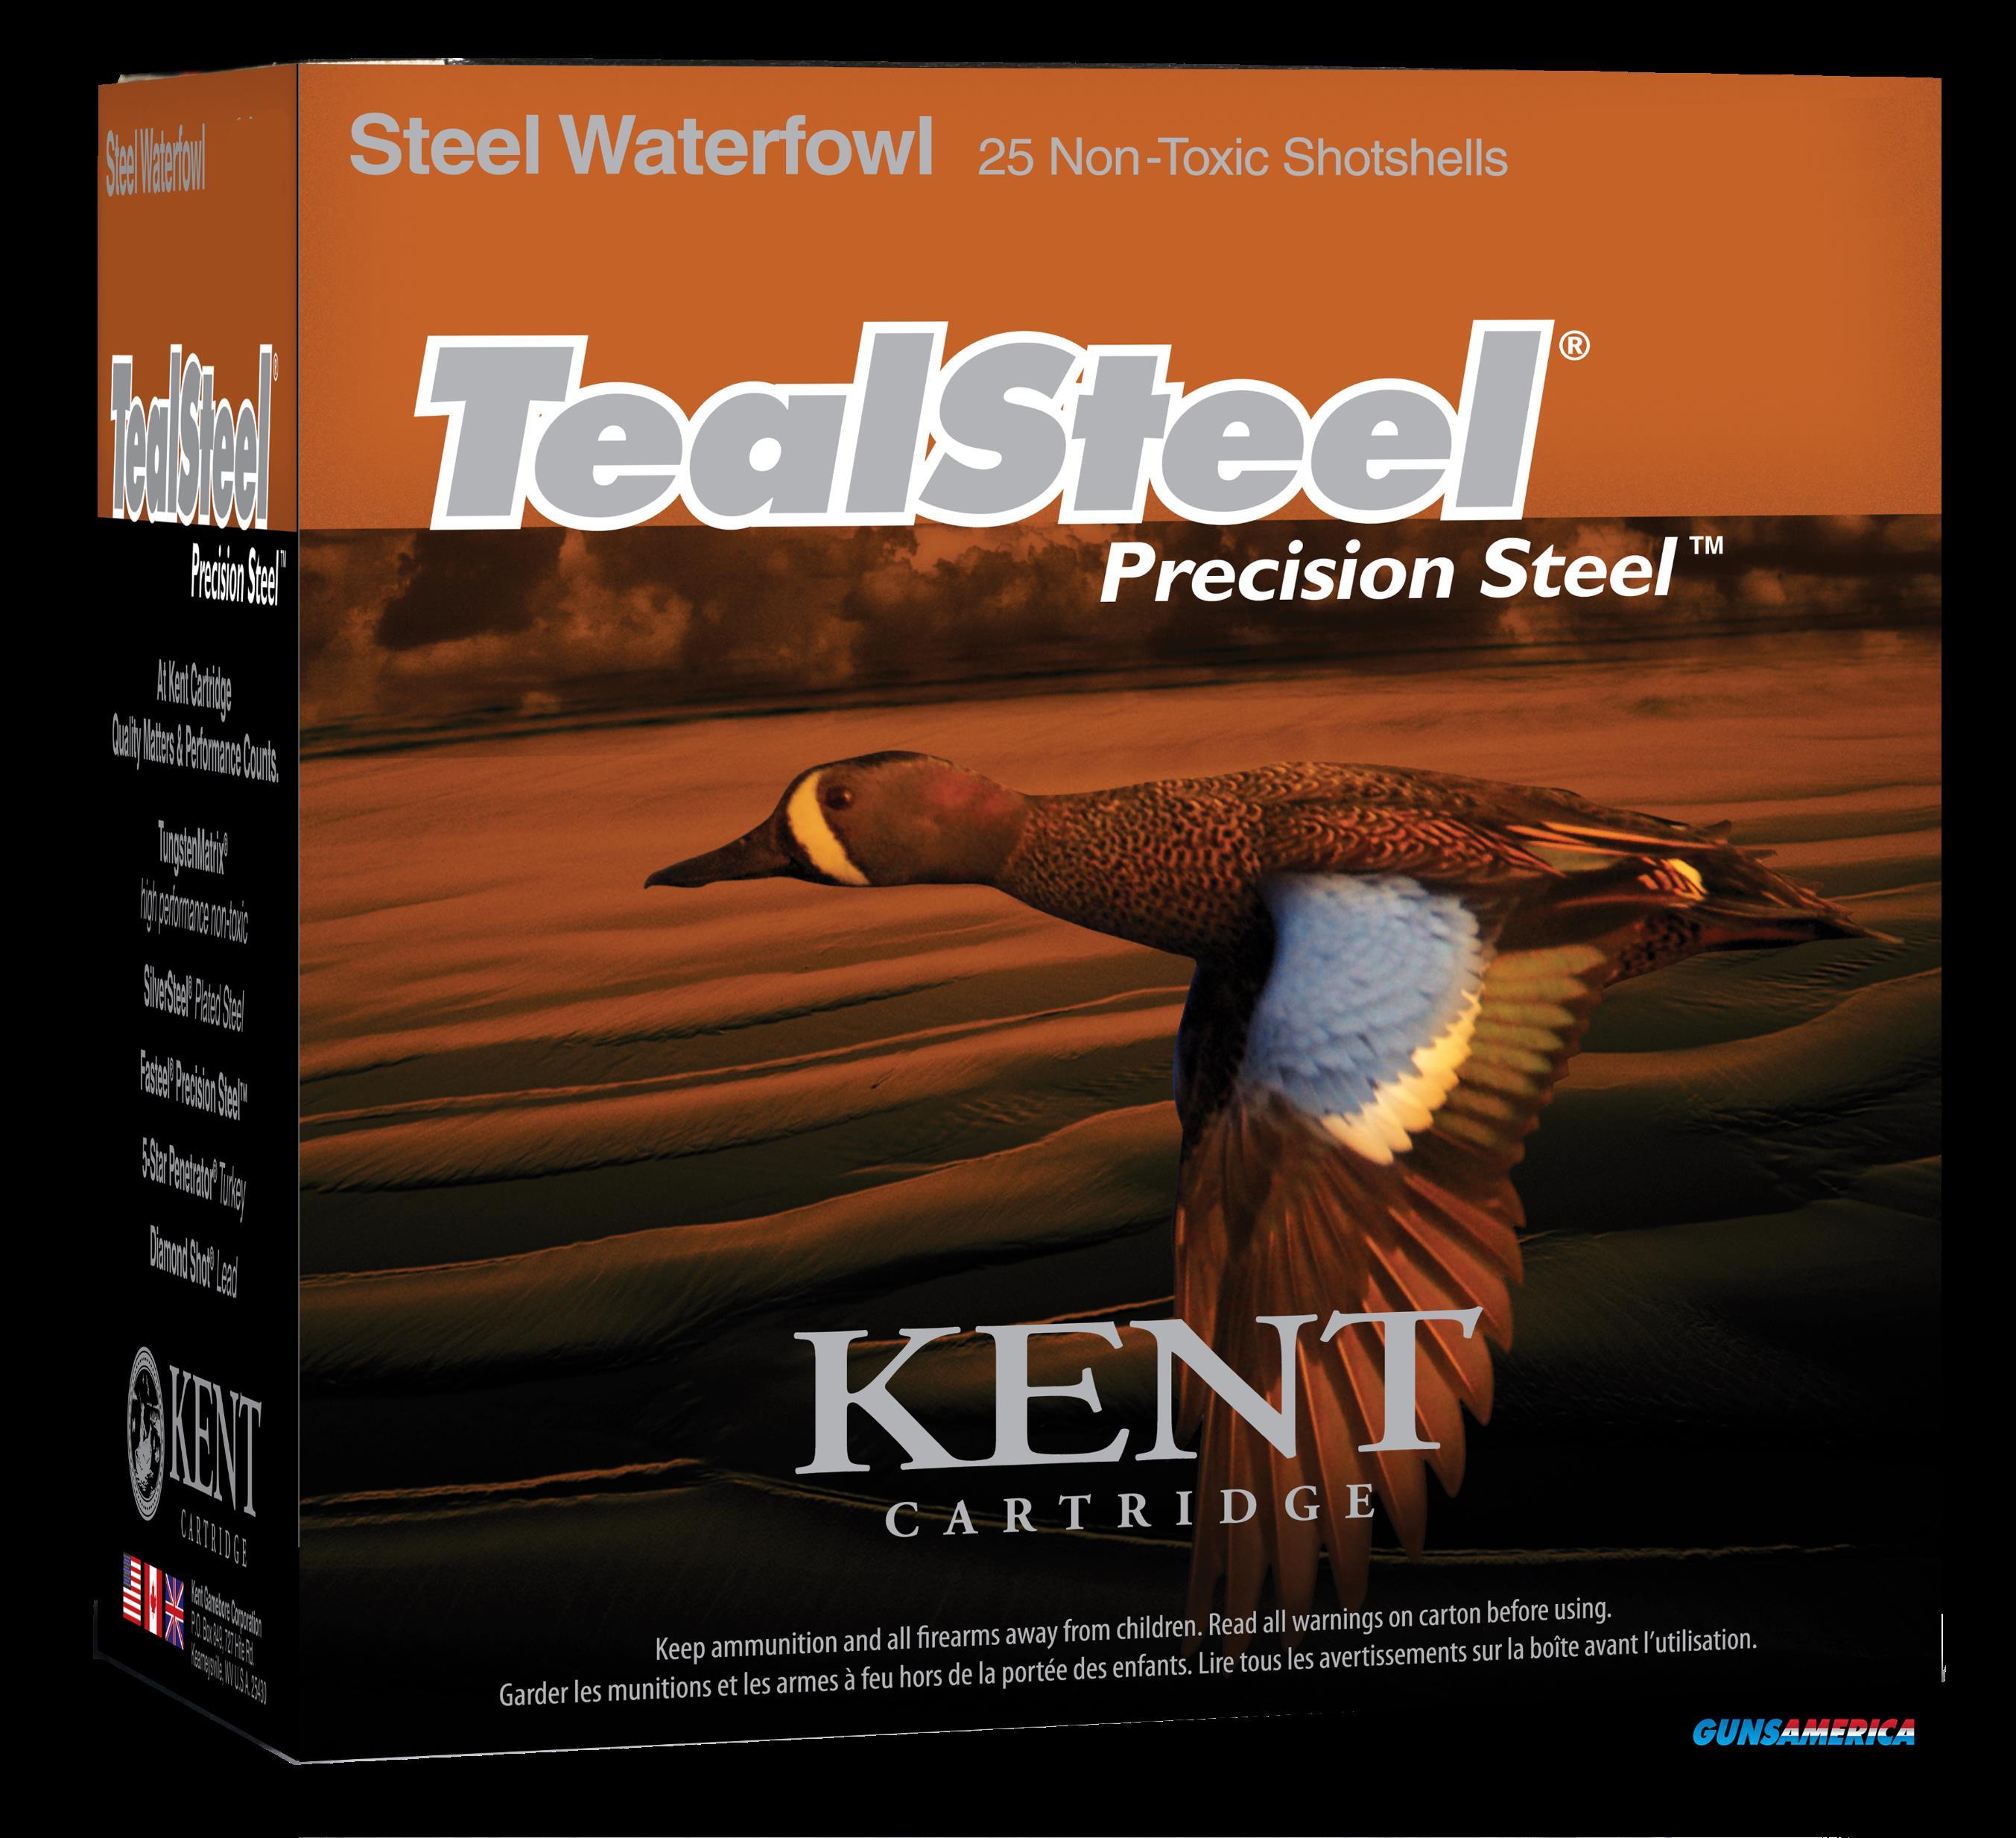 Kent Cartridge Teal Steel, Kent Kts203286  3in  1oz   Teal Stl          25-10  Guns > Pistols > 1911 Pistol Copies (non-Colt)